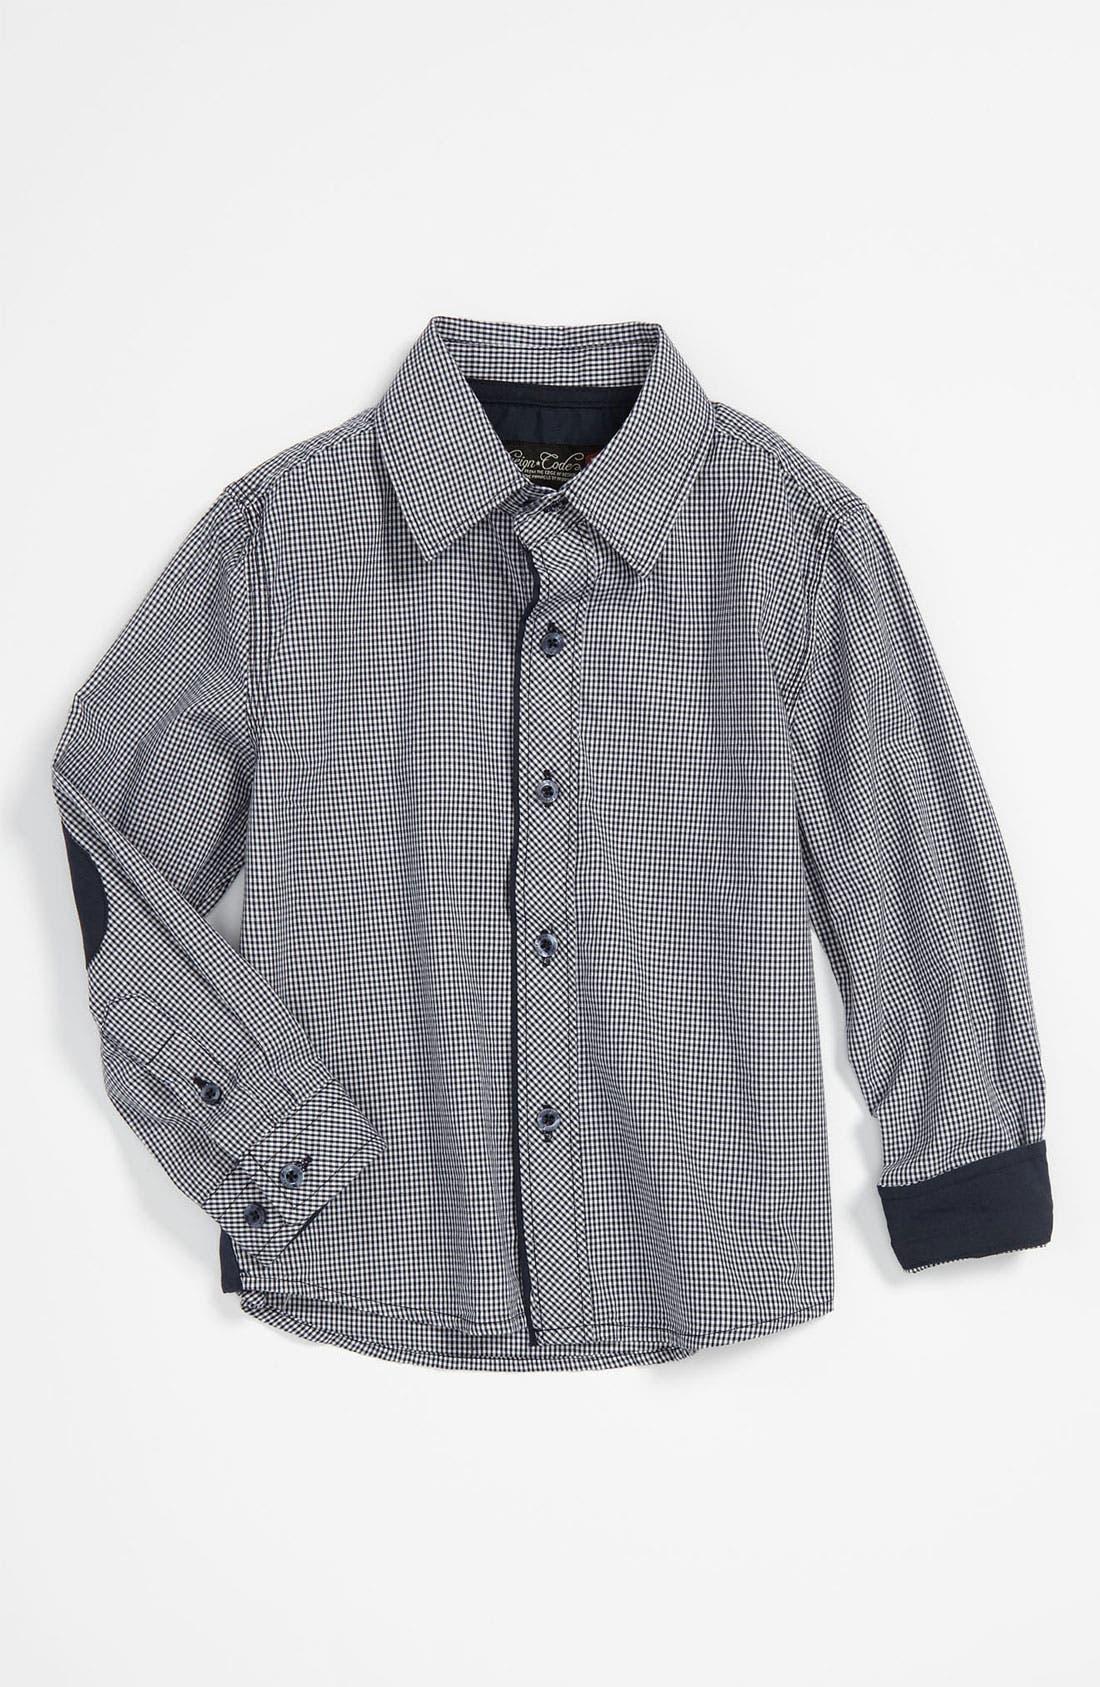 Main Image - Sovereign Code Gingham Shirt (Infant)